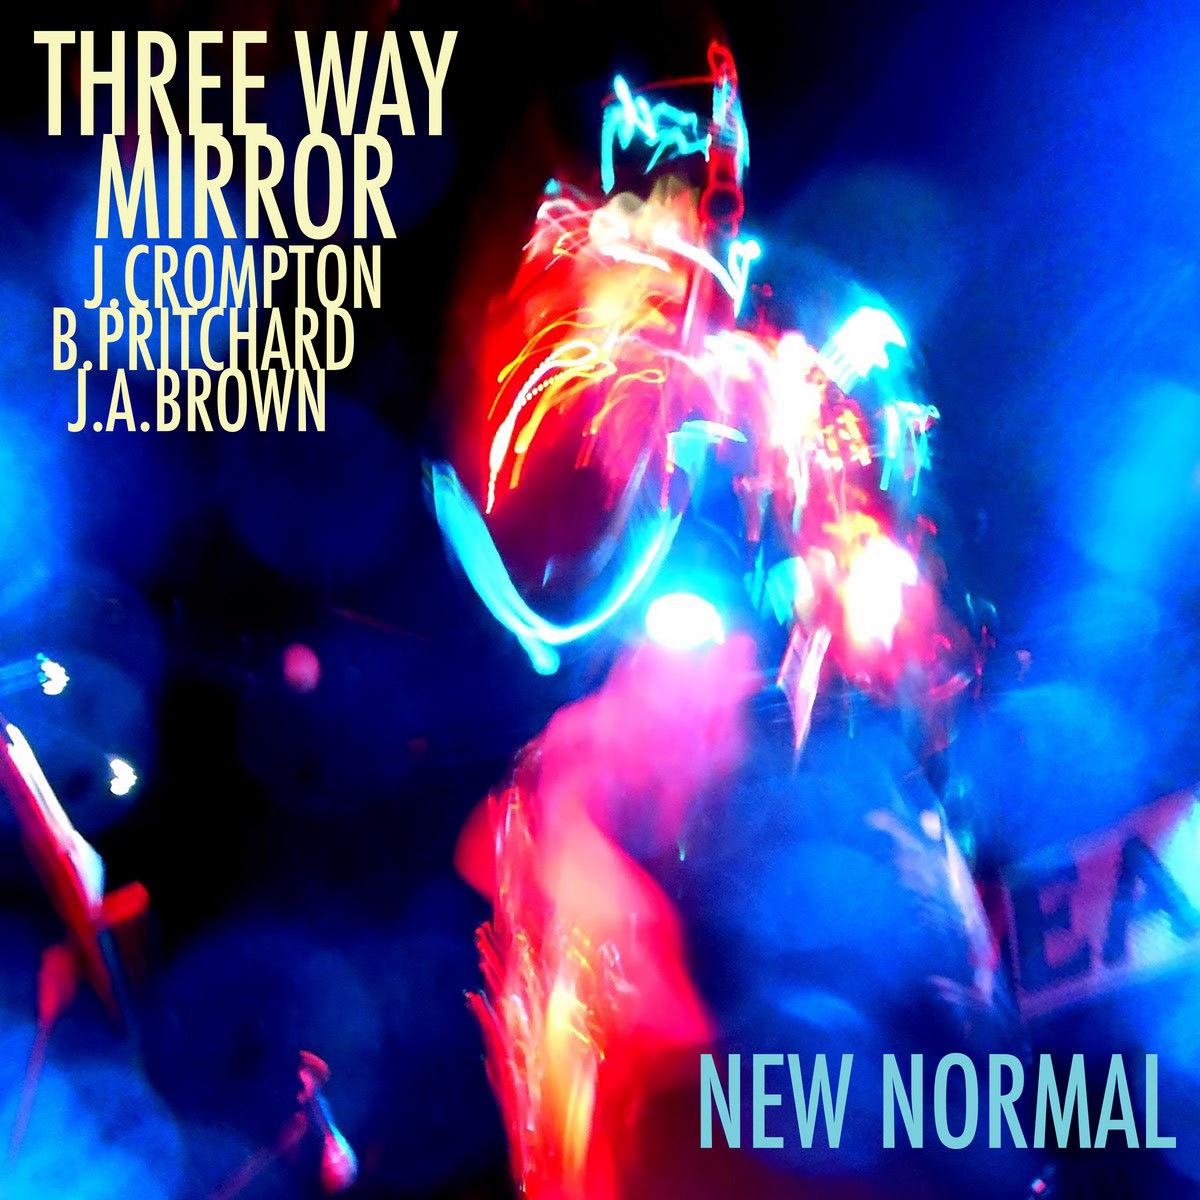 Album design by Colin Bragg for Three Way Mirror